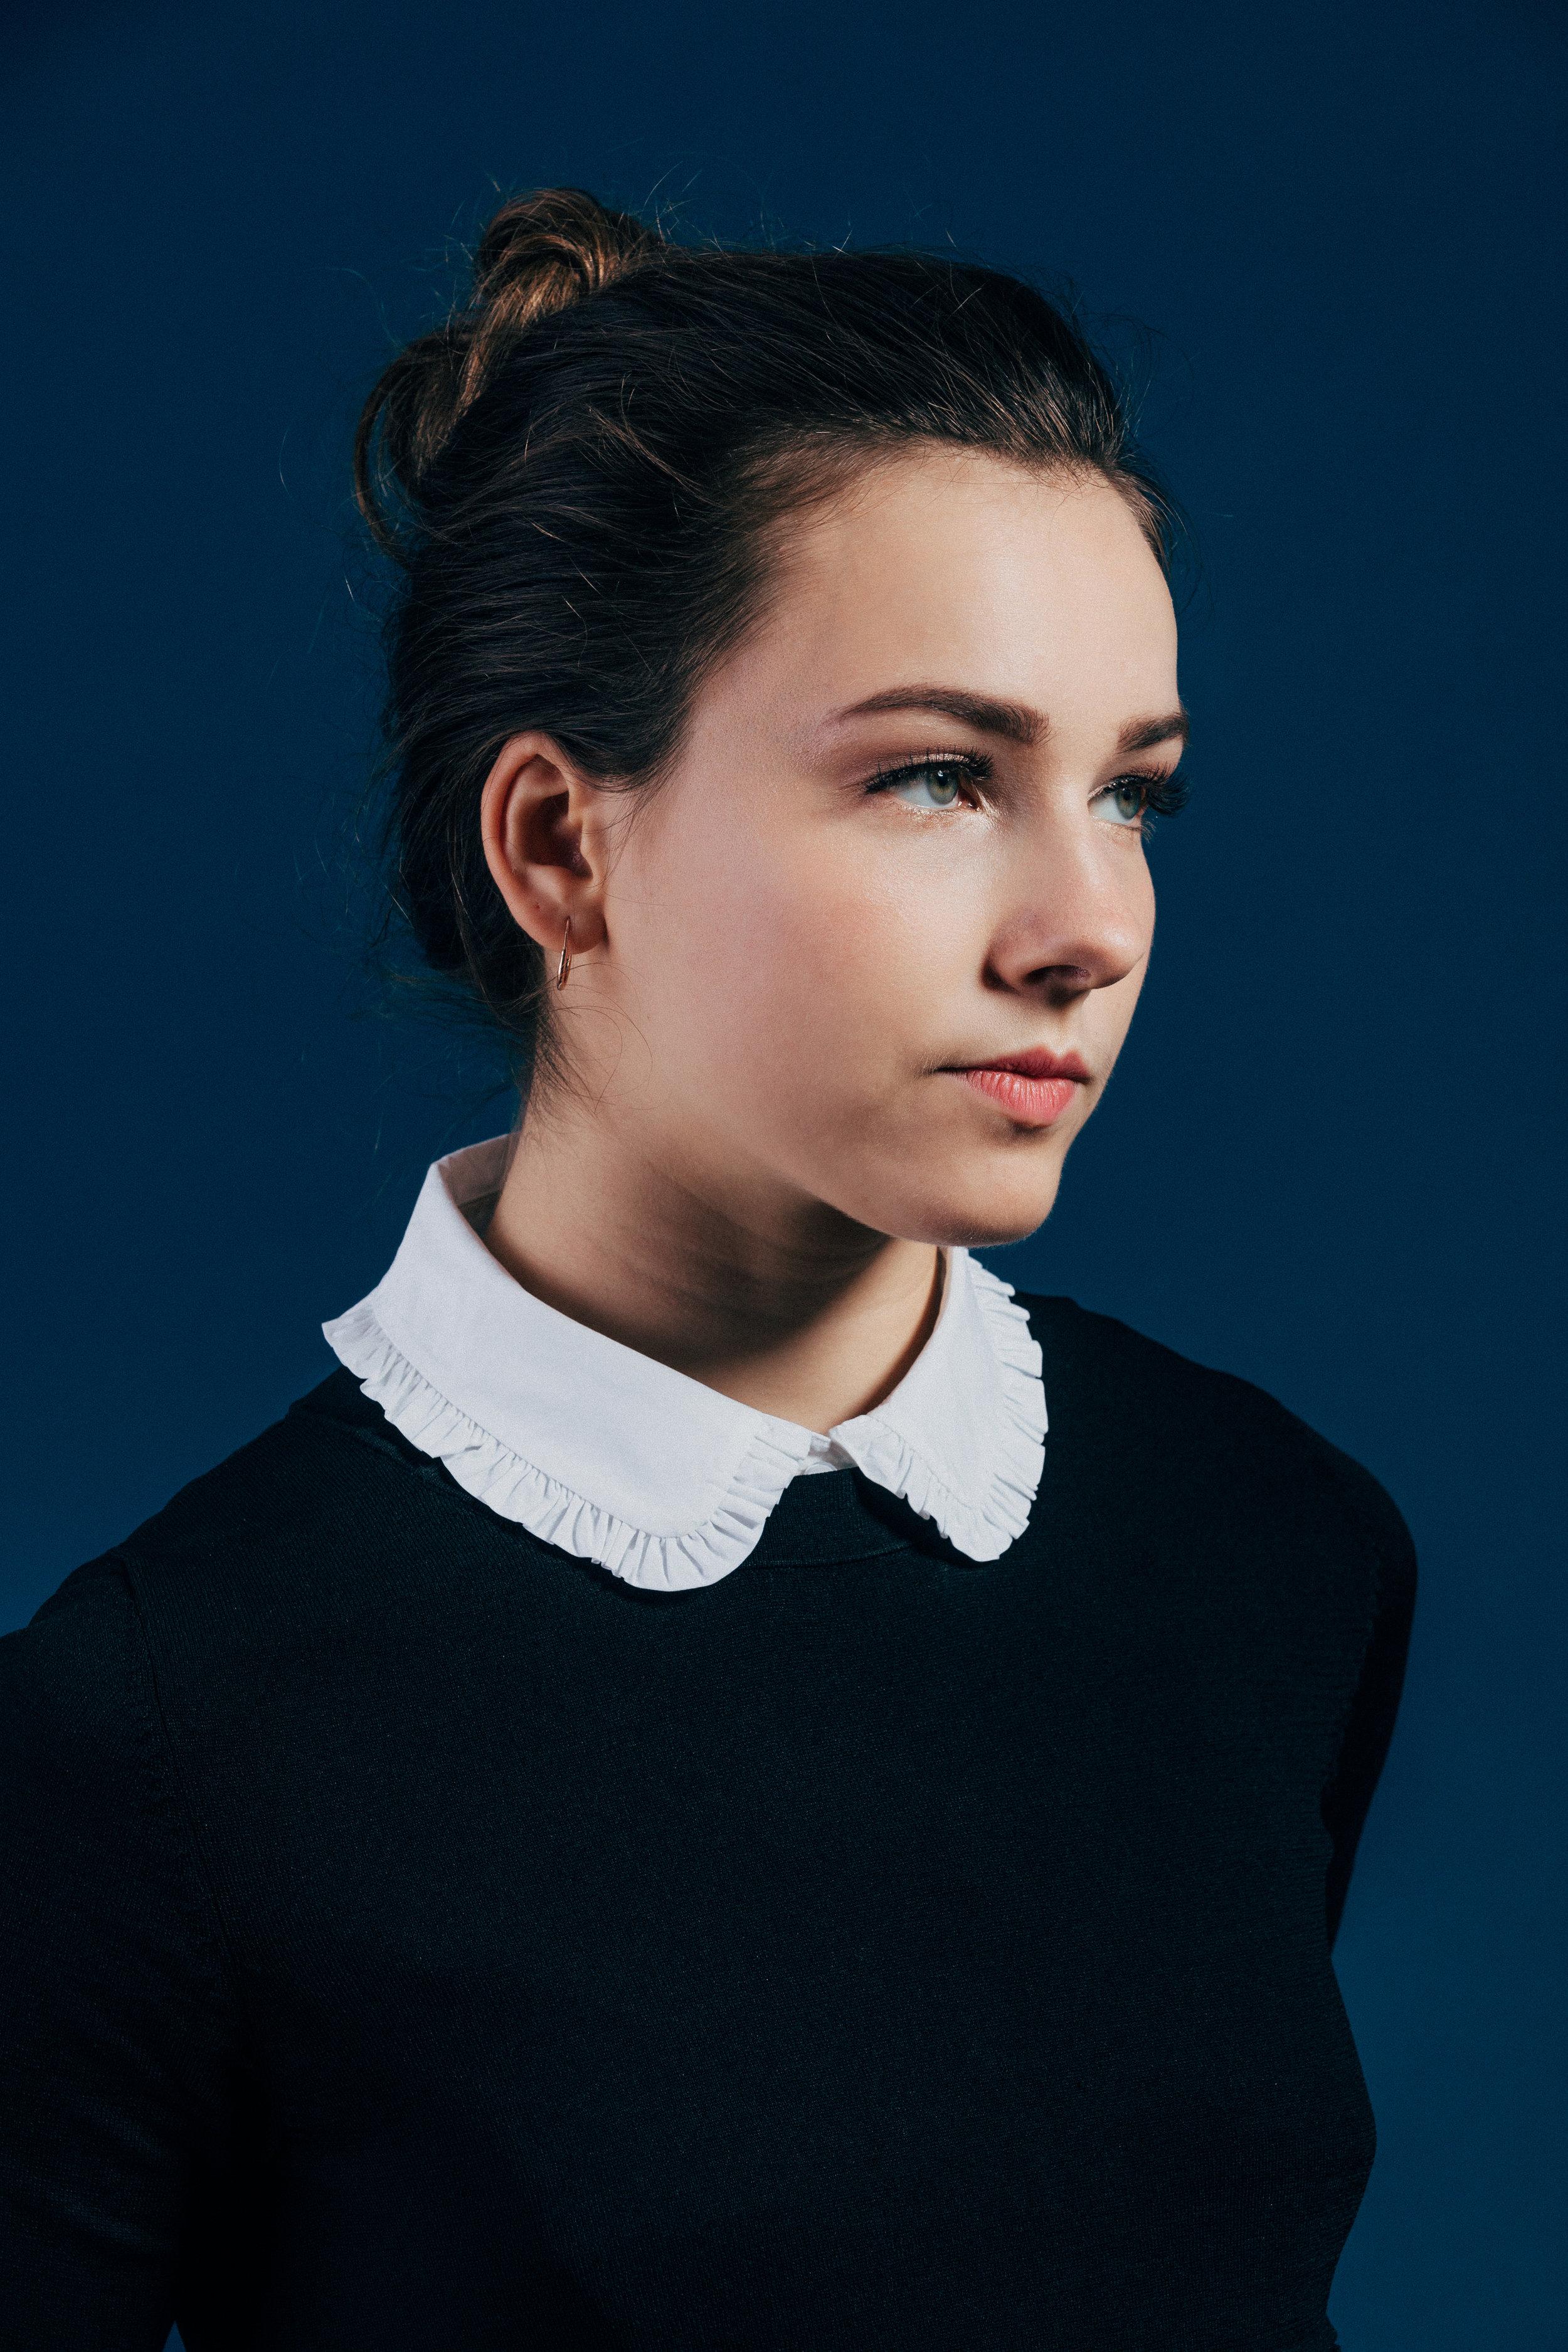 Kseniya Bella Agency Brooklyn New York Model Emanuel Hahn Photography 2